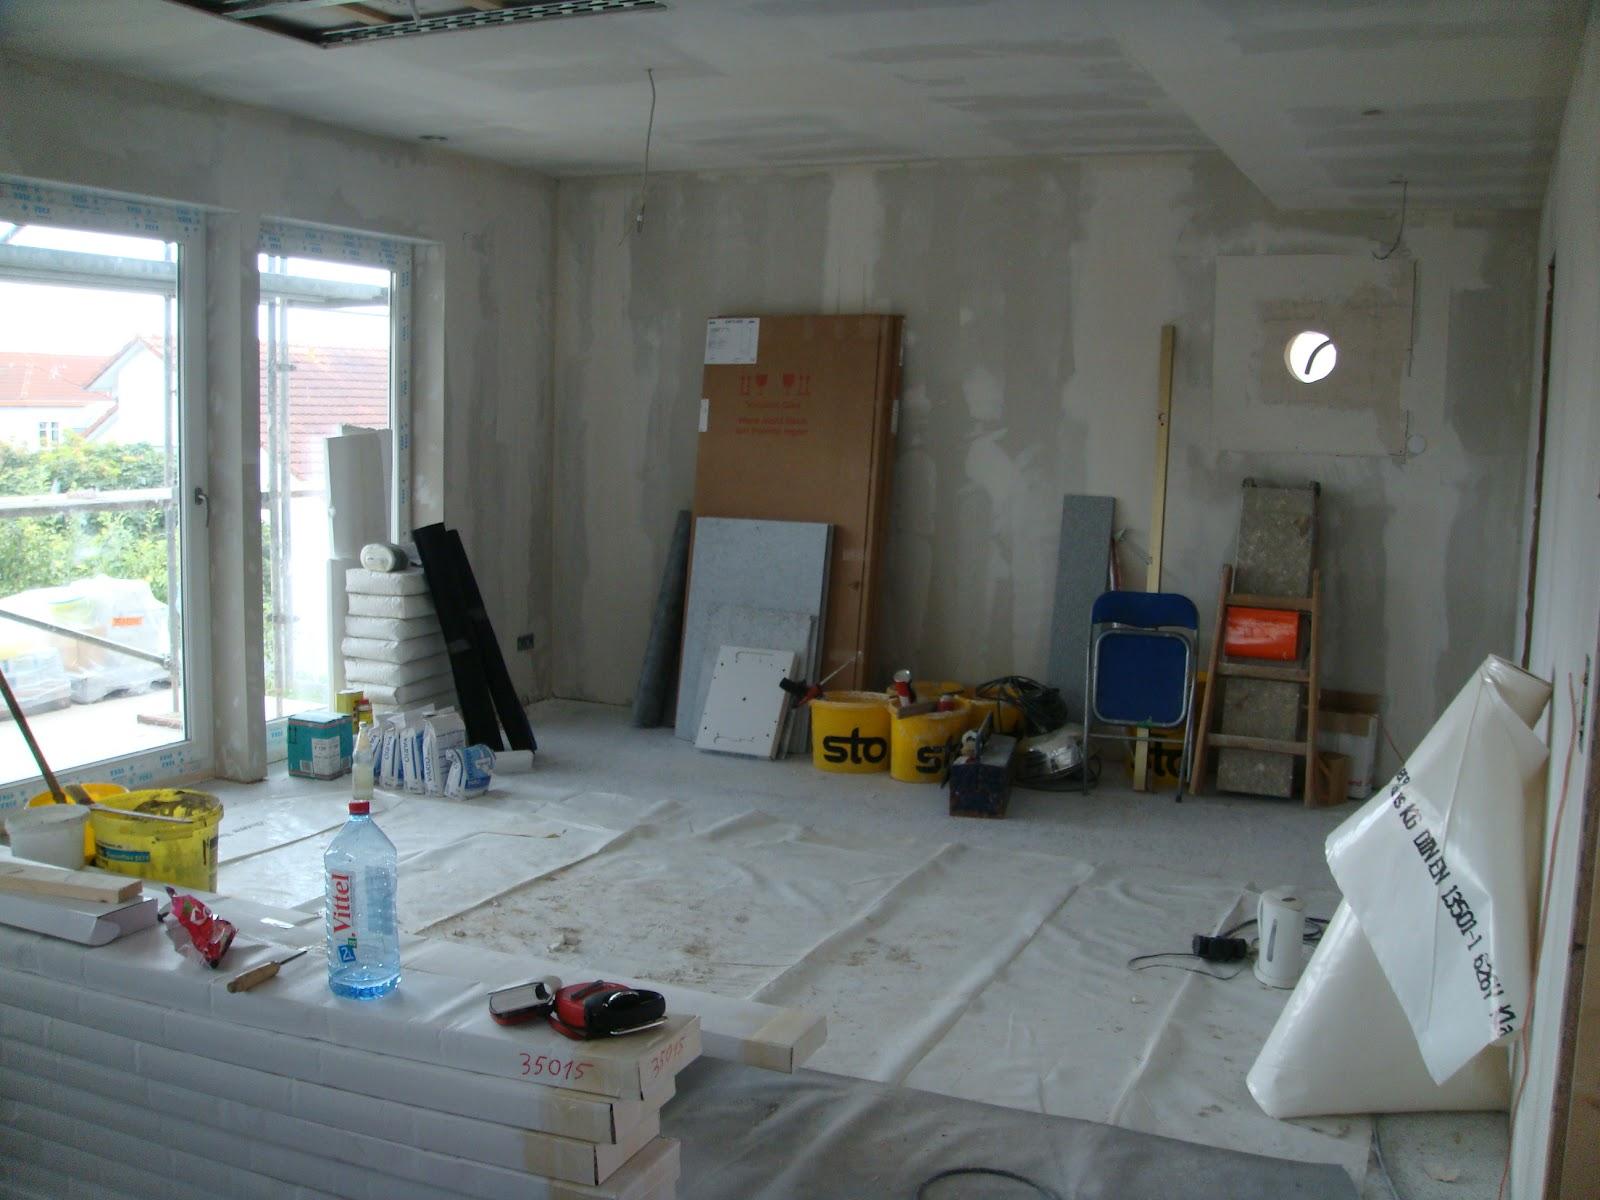 Unser Neubau als Fertighaus in Tumringen: So siehts momentan innen ...